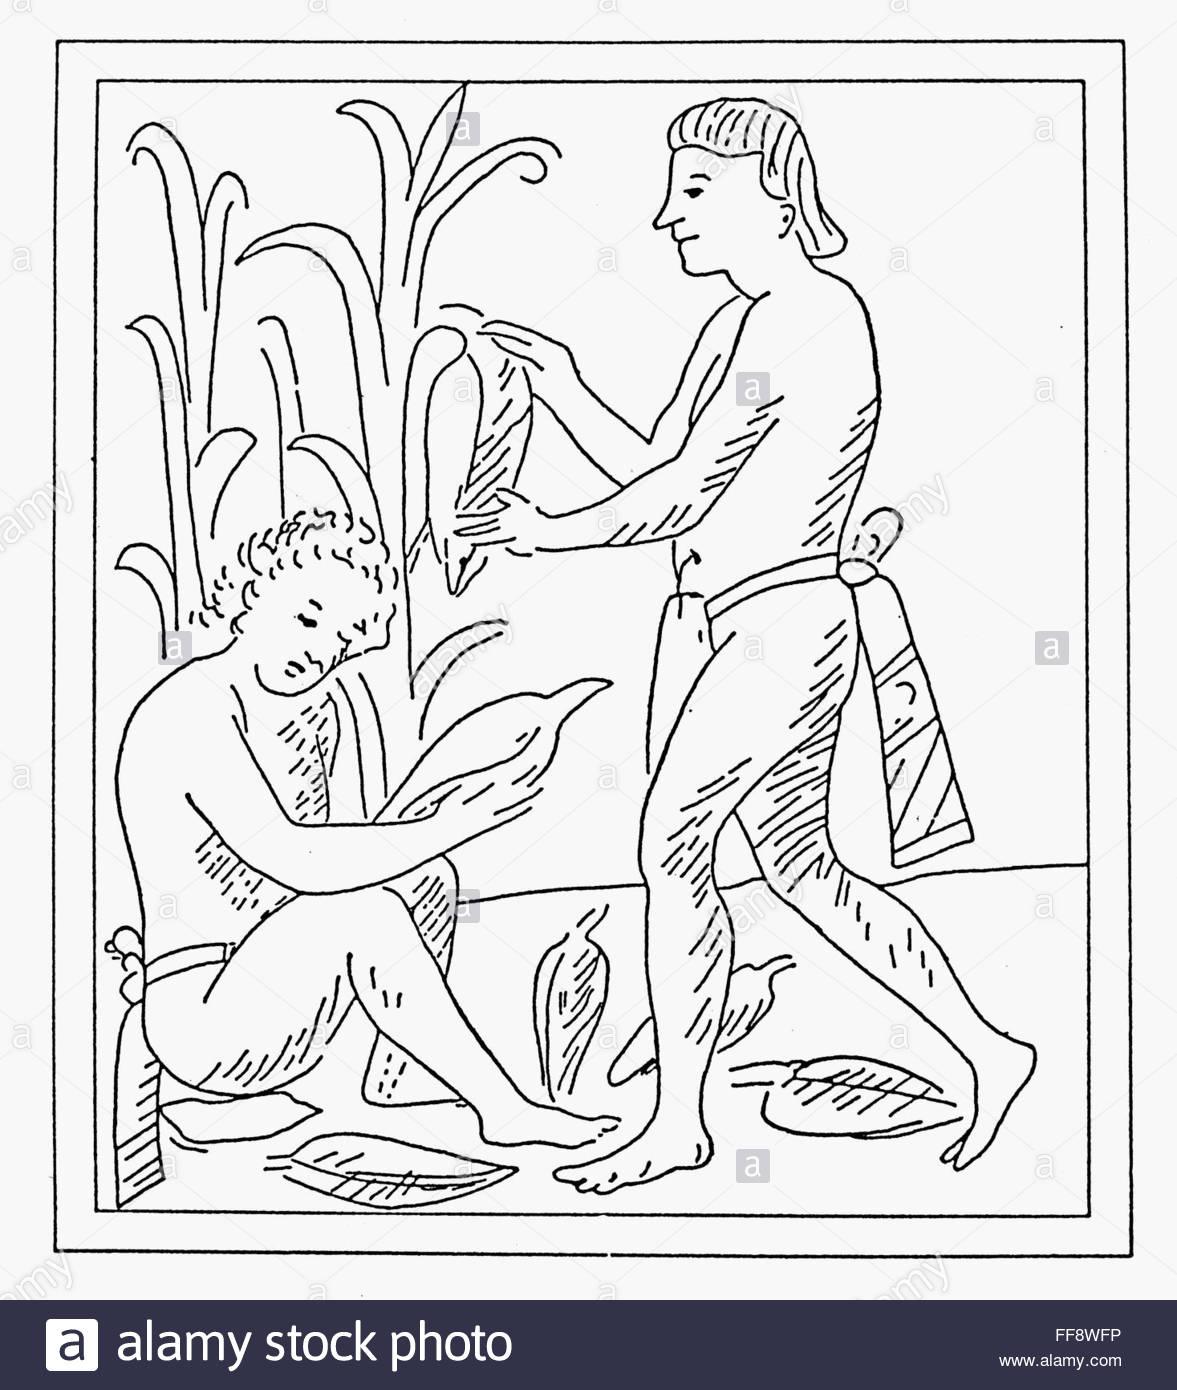 1177x1390 Aztec Farmers. Naztec Farmers Harvesting The Corn Crop. Line